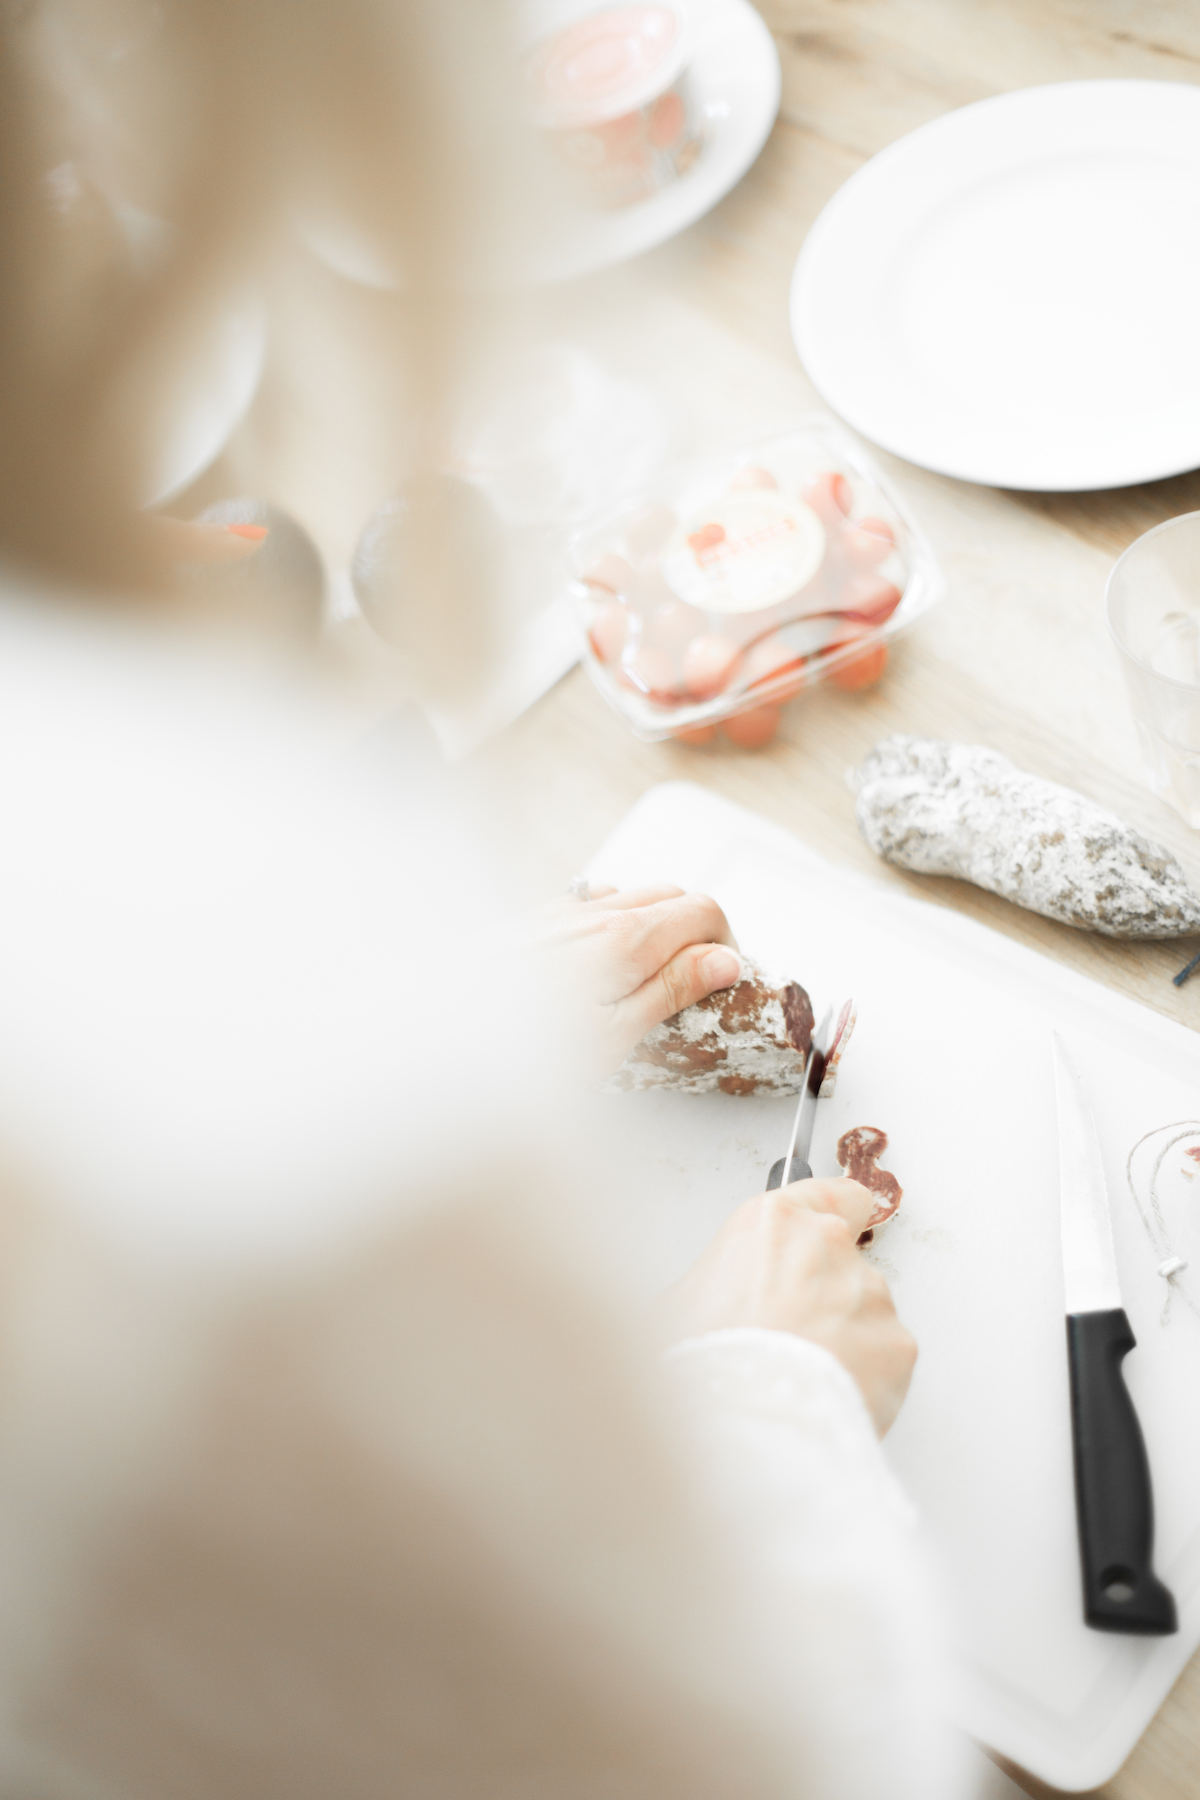 annecy-wedding-photos-6.jpg